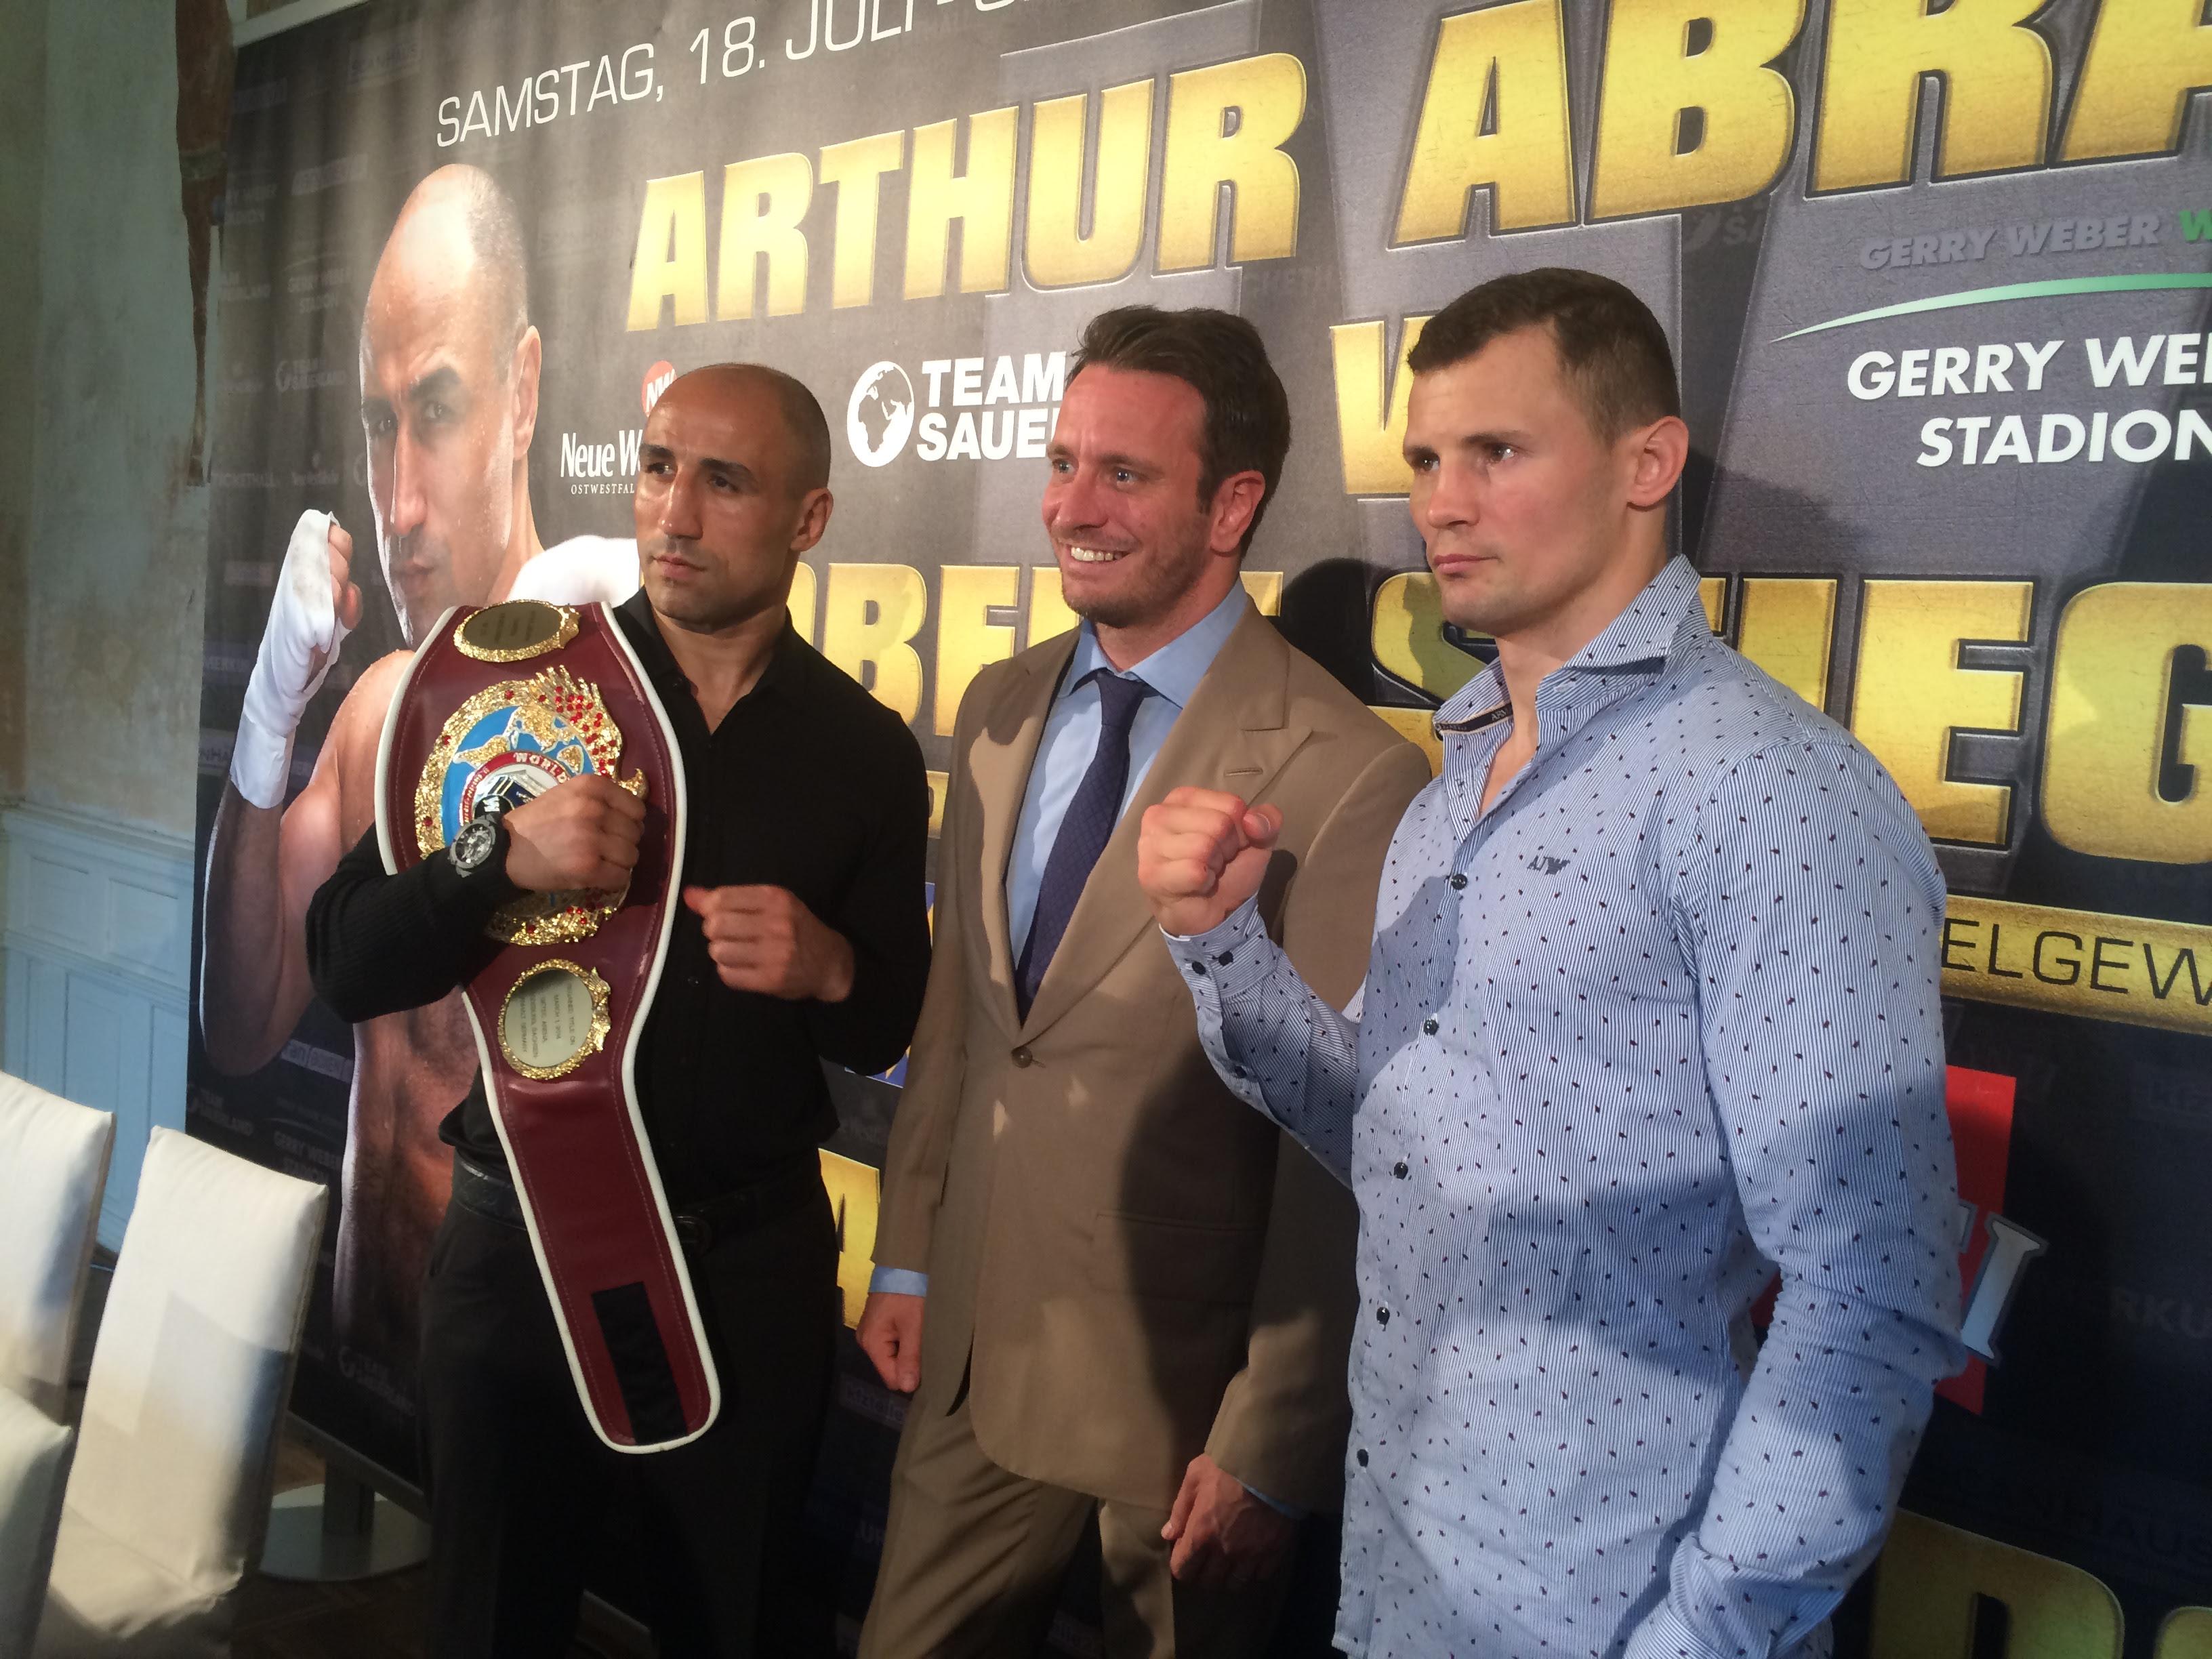 Arthur Abraham VS Robert Stieglitz